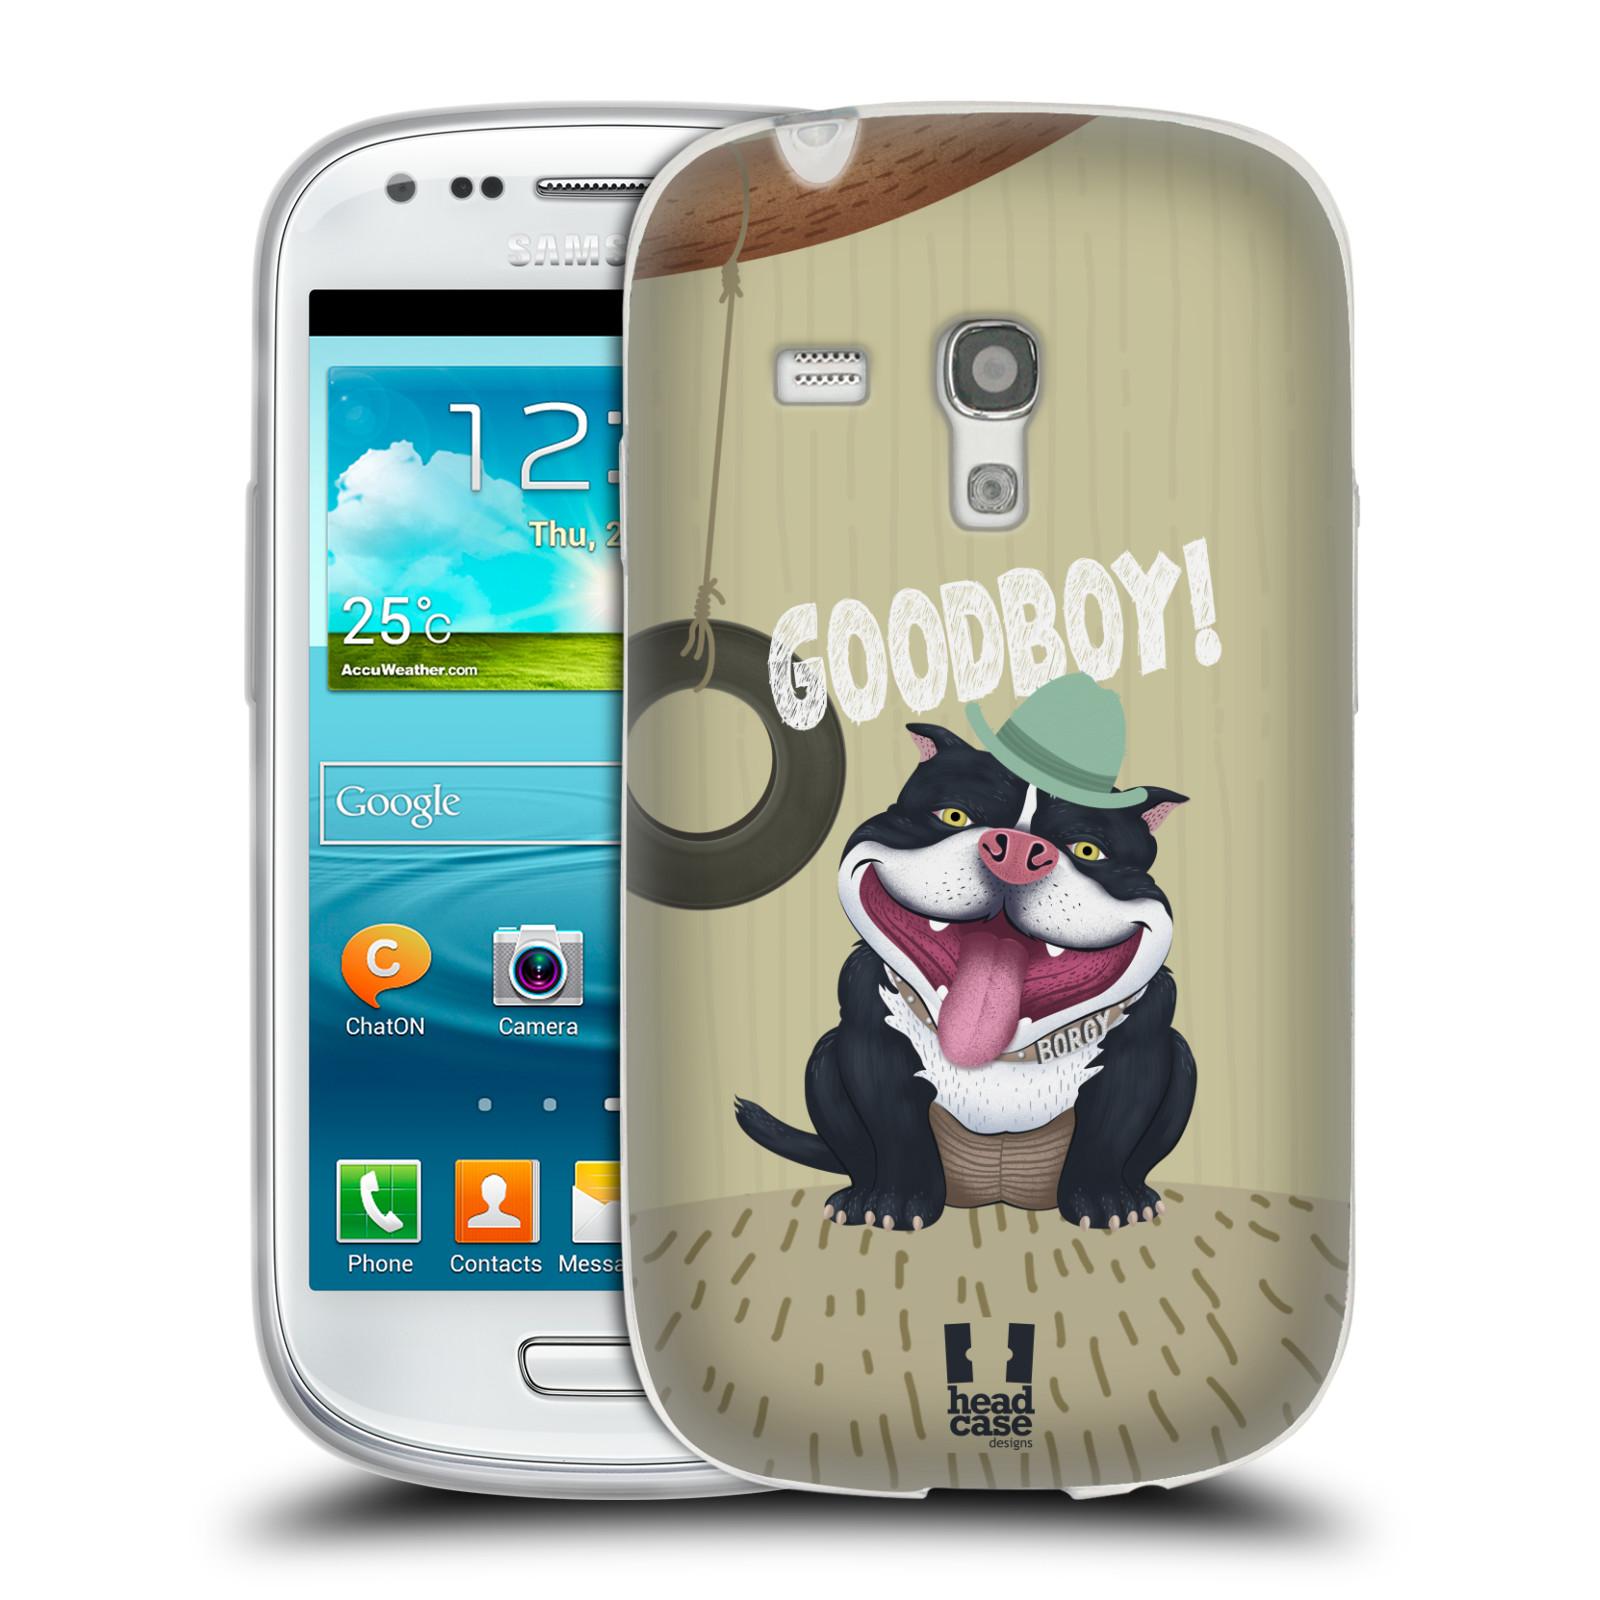 Silikonové pouzdro na mobil Samsung Galaxy S III Mini HEAD CASE Goodboy! Pejsek (Silikonový kryt či obal na mobilní telefon Samsung Galaxy S III Mini GT-i8190)